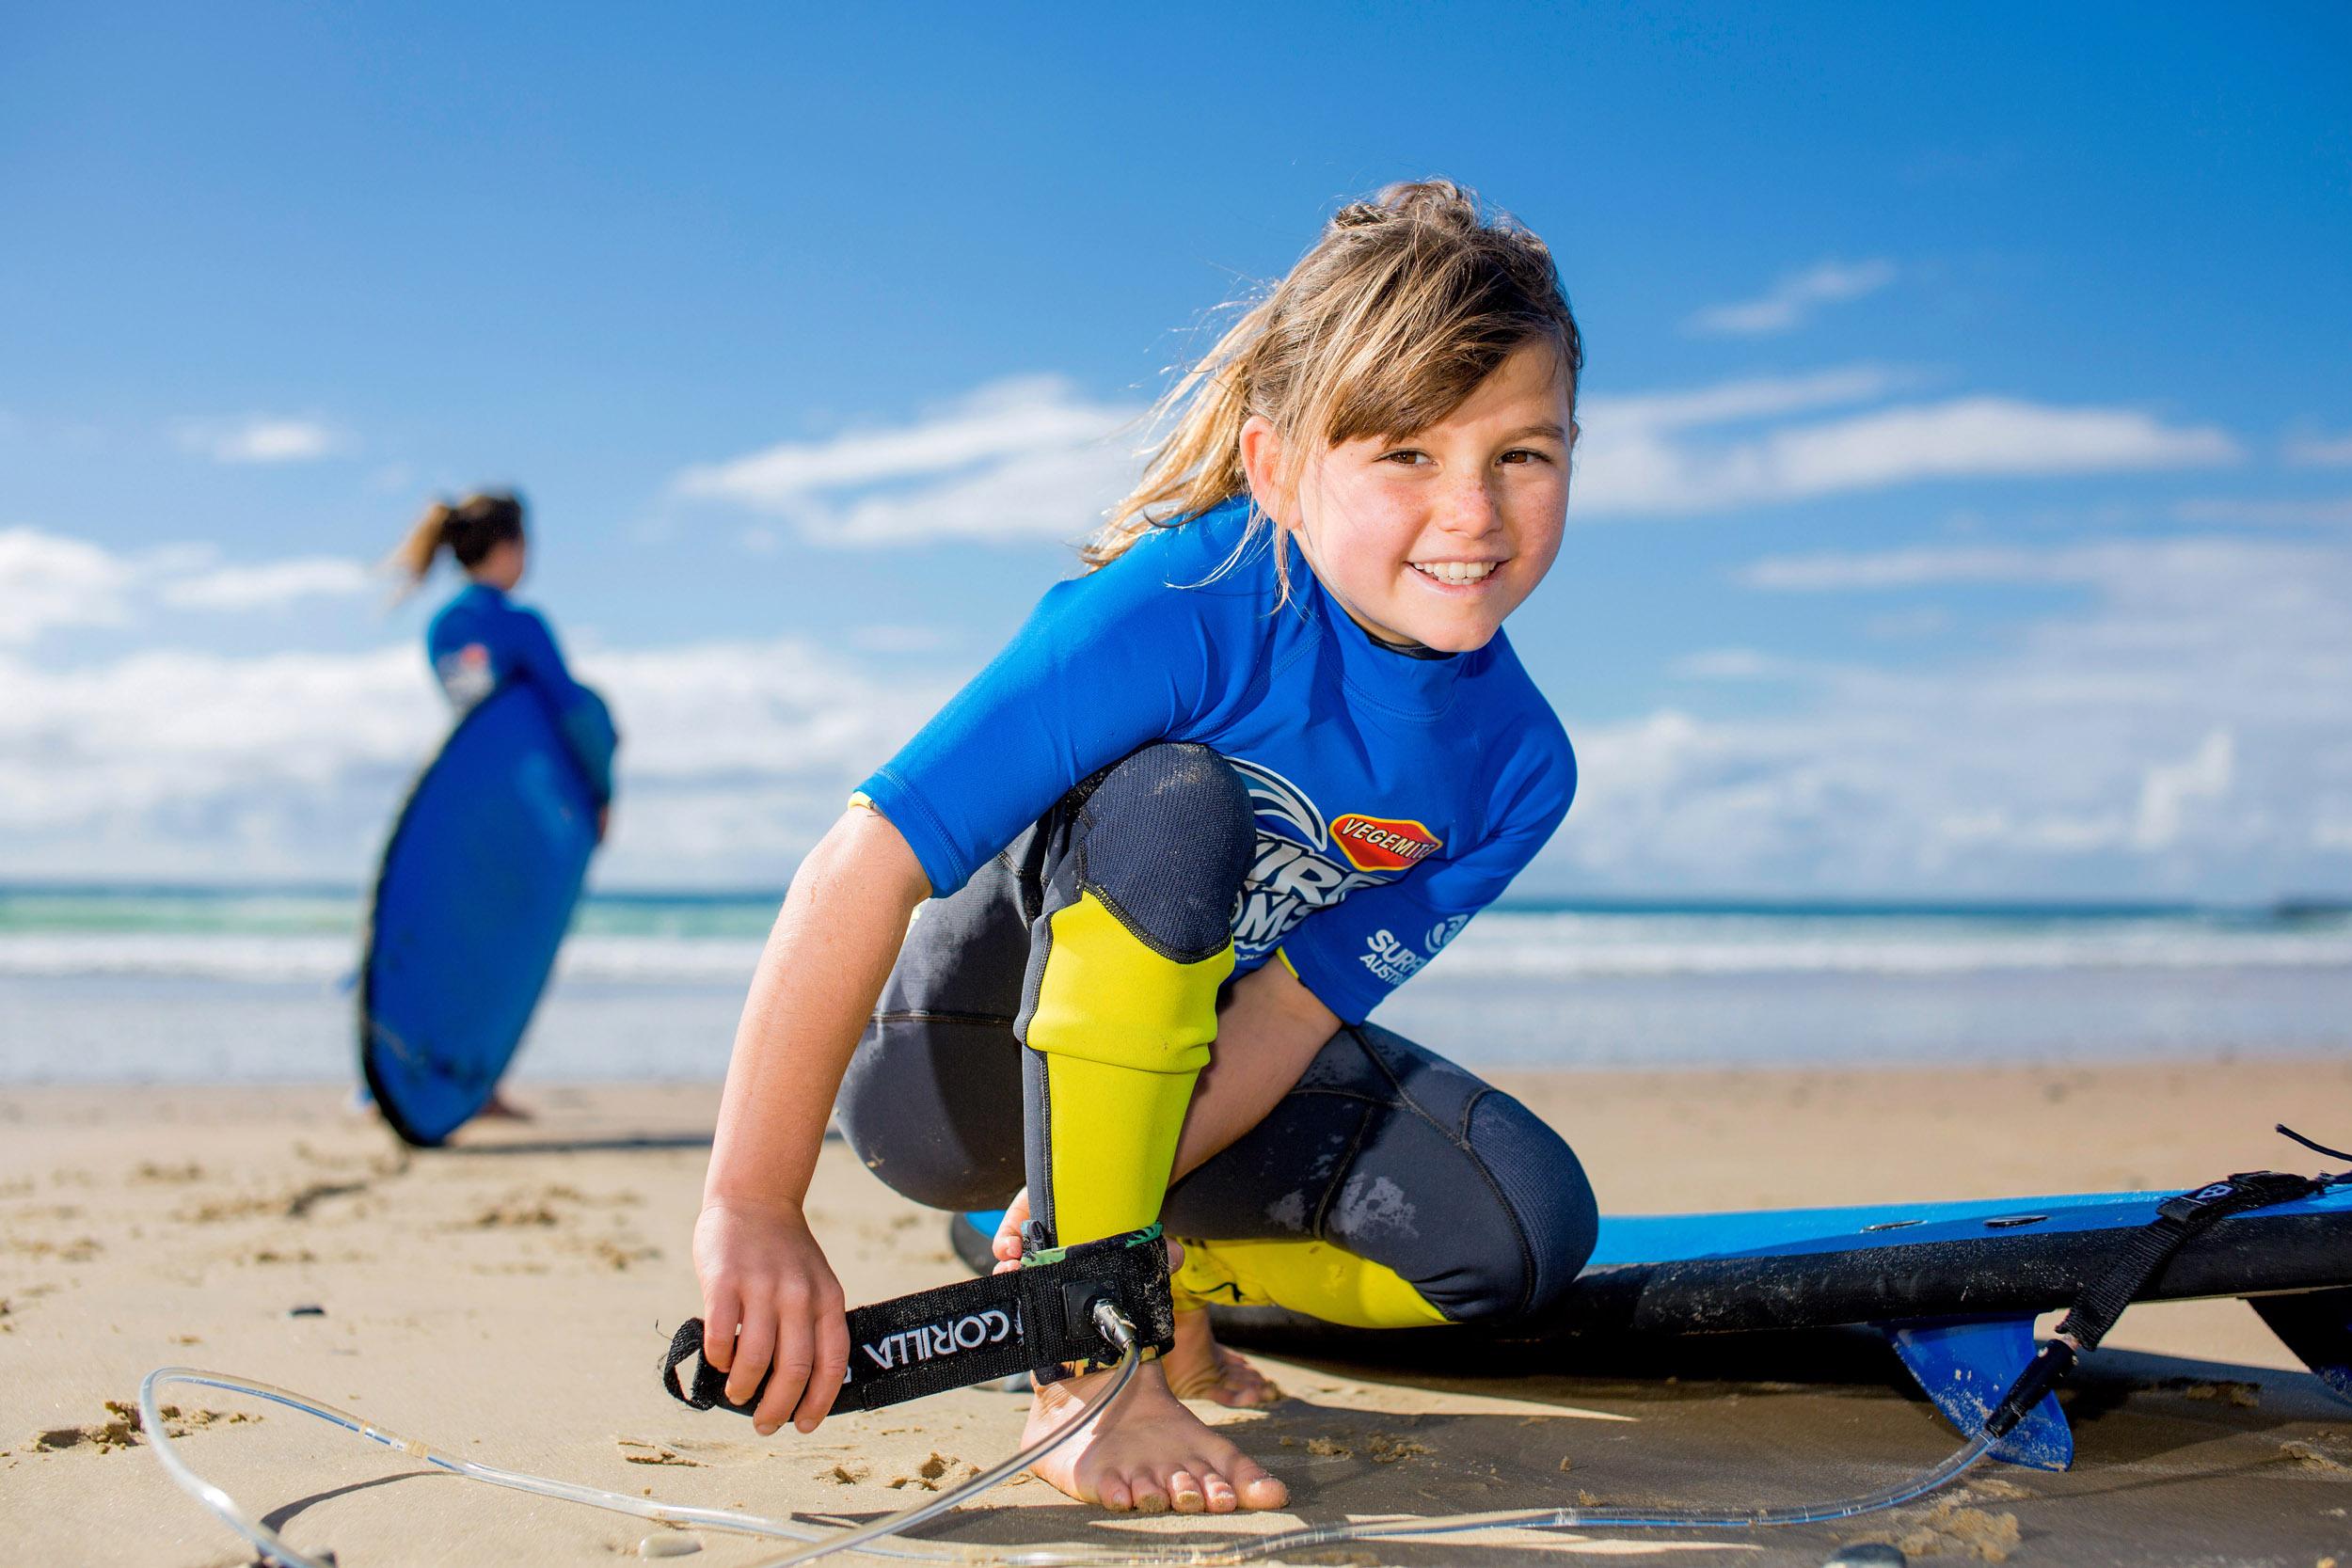 surfing-australia-surf-groms-photography-girls-surfing.jpg